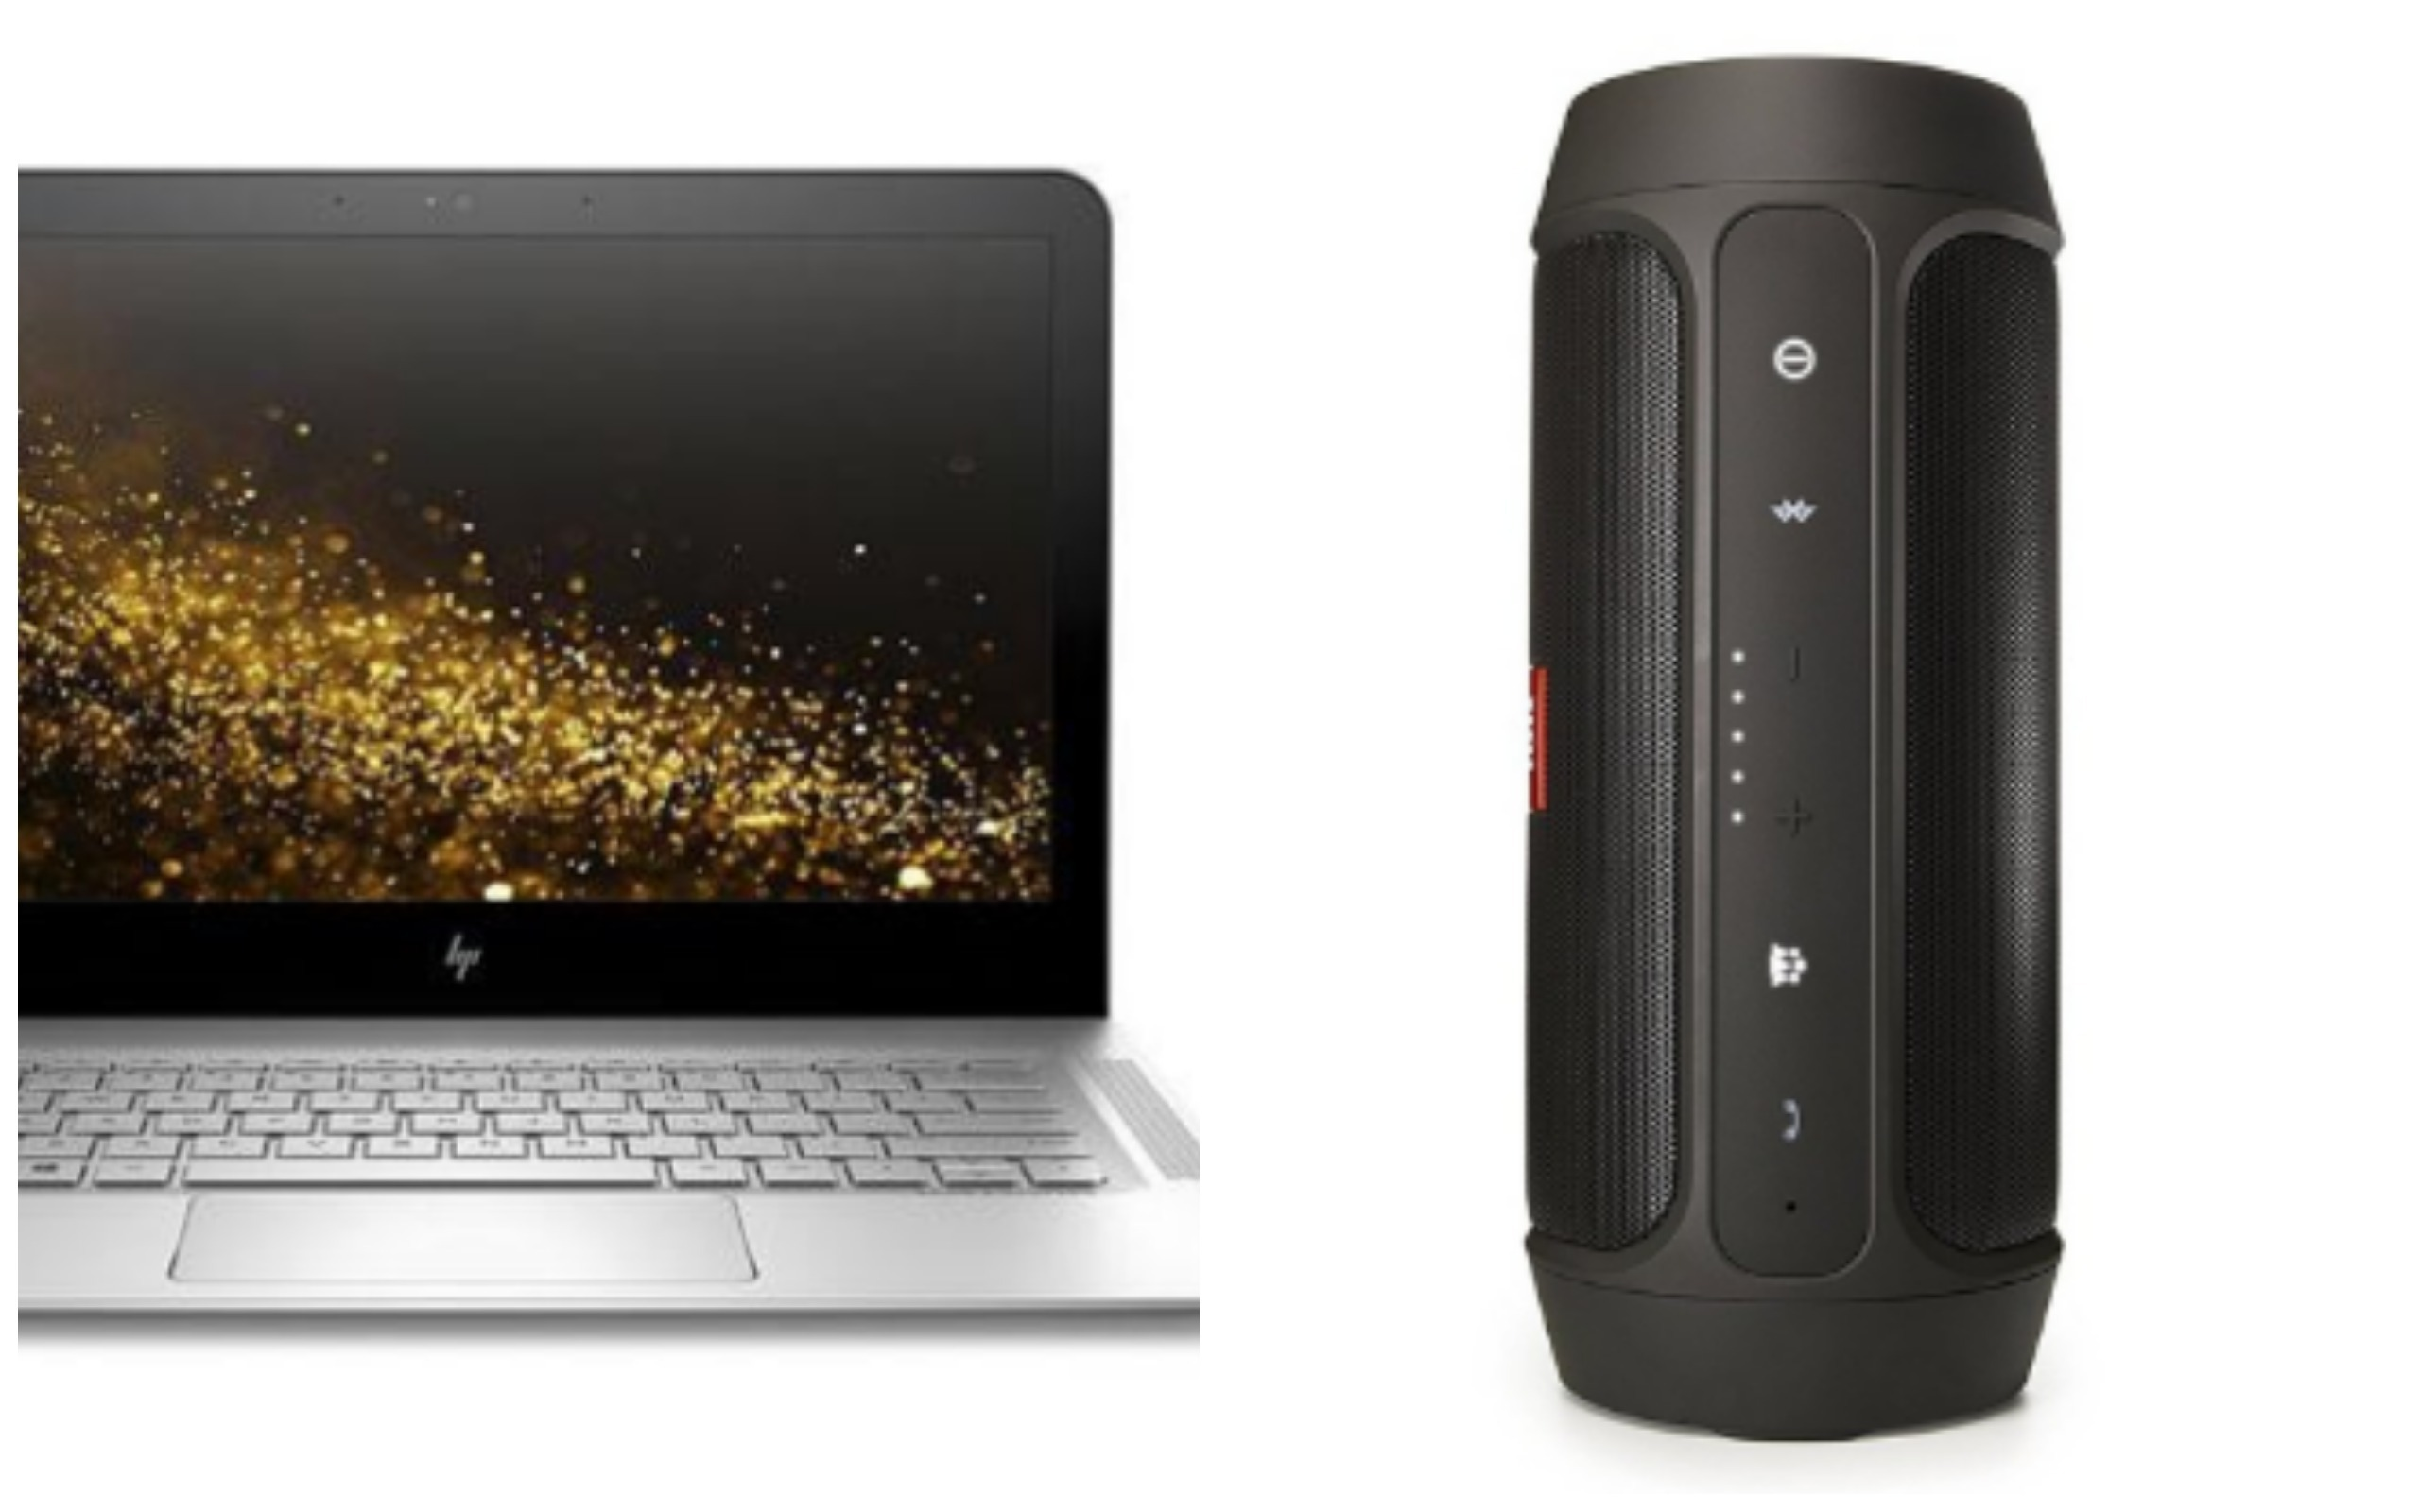 Laptop Prices In Singapore HP Envy JBL Speaker